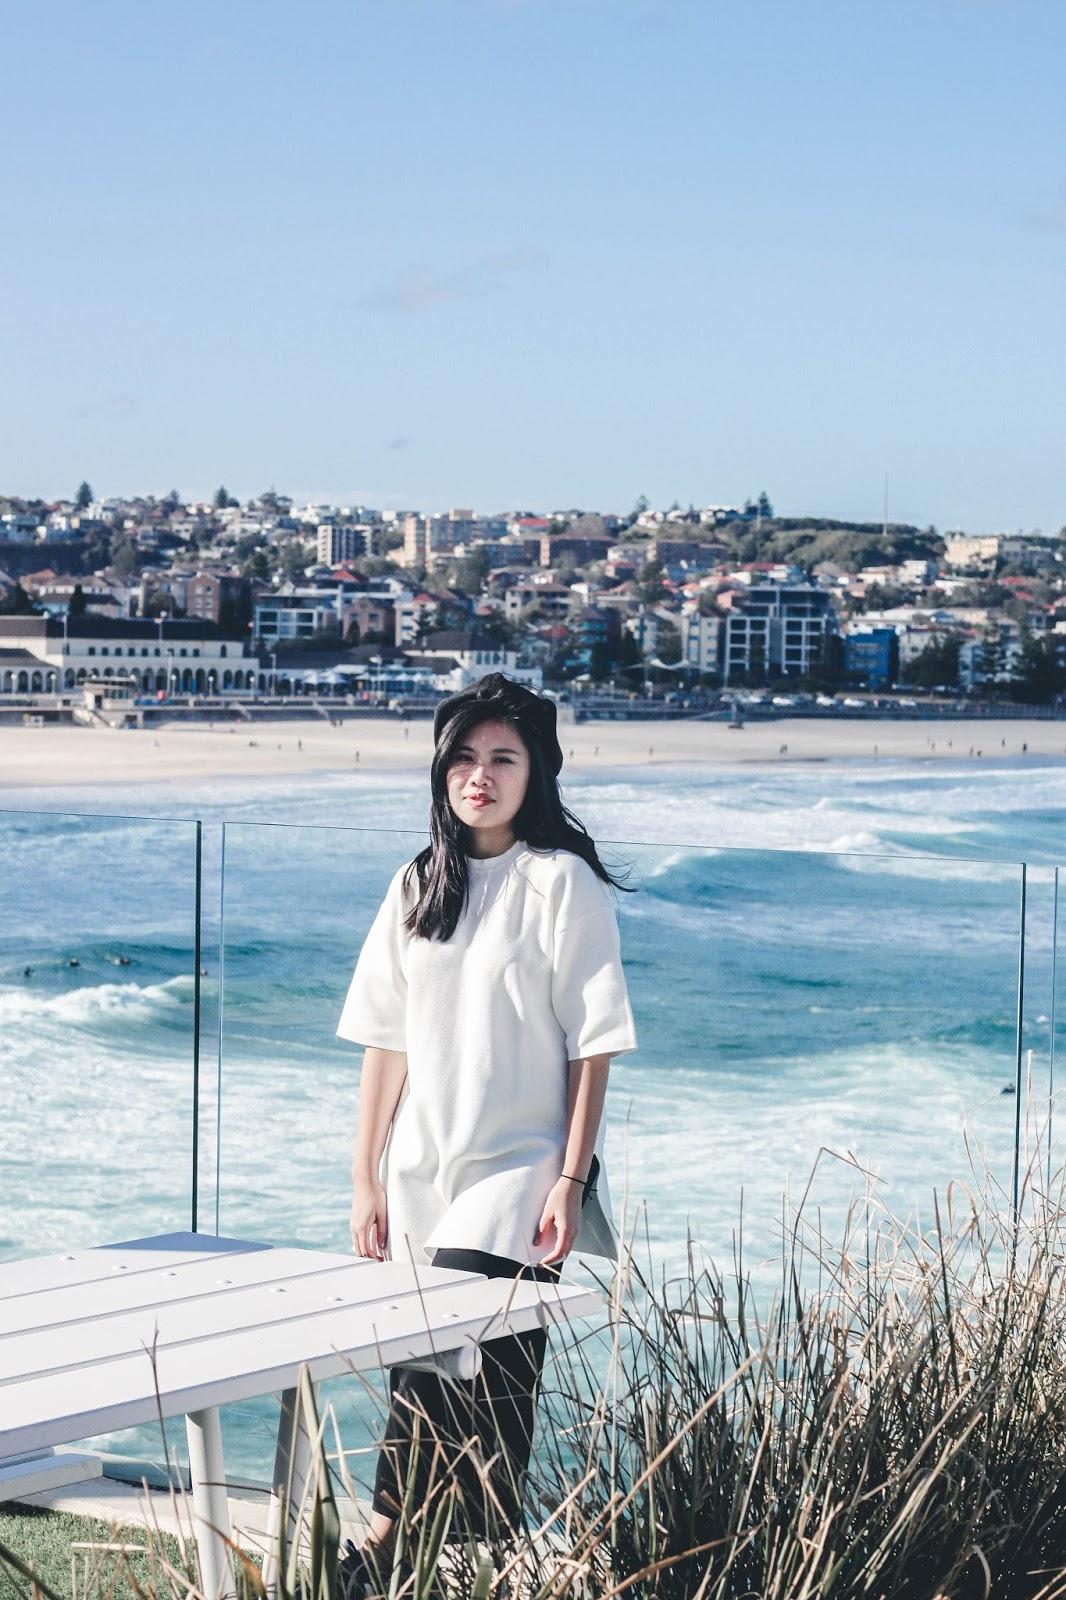 singapore blogger traveler sydney australia style photographer look book wiwt stylexstyle holiday street